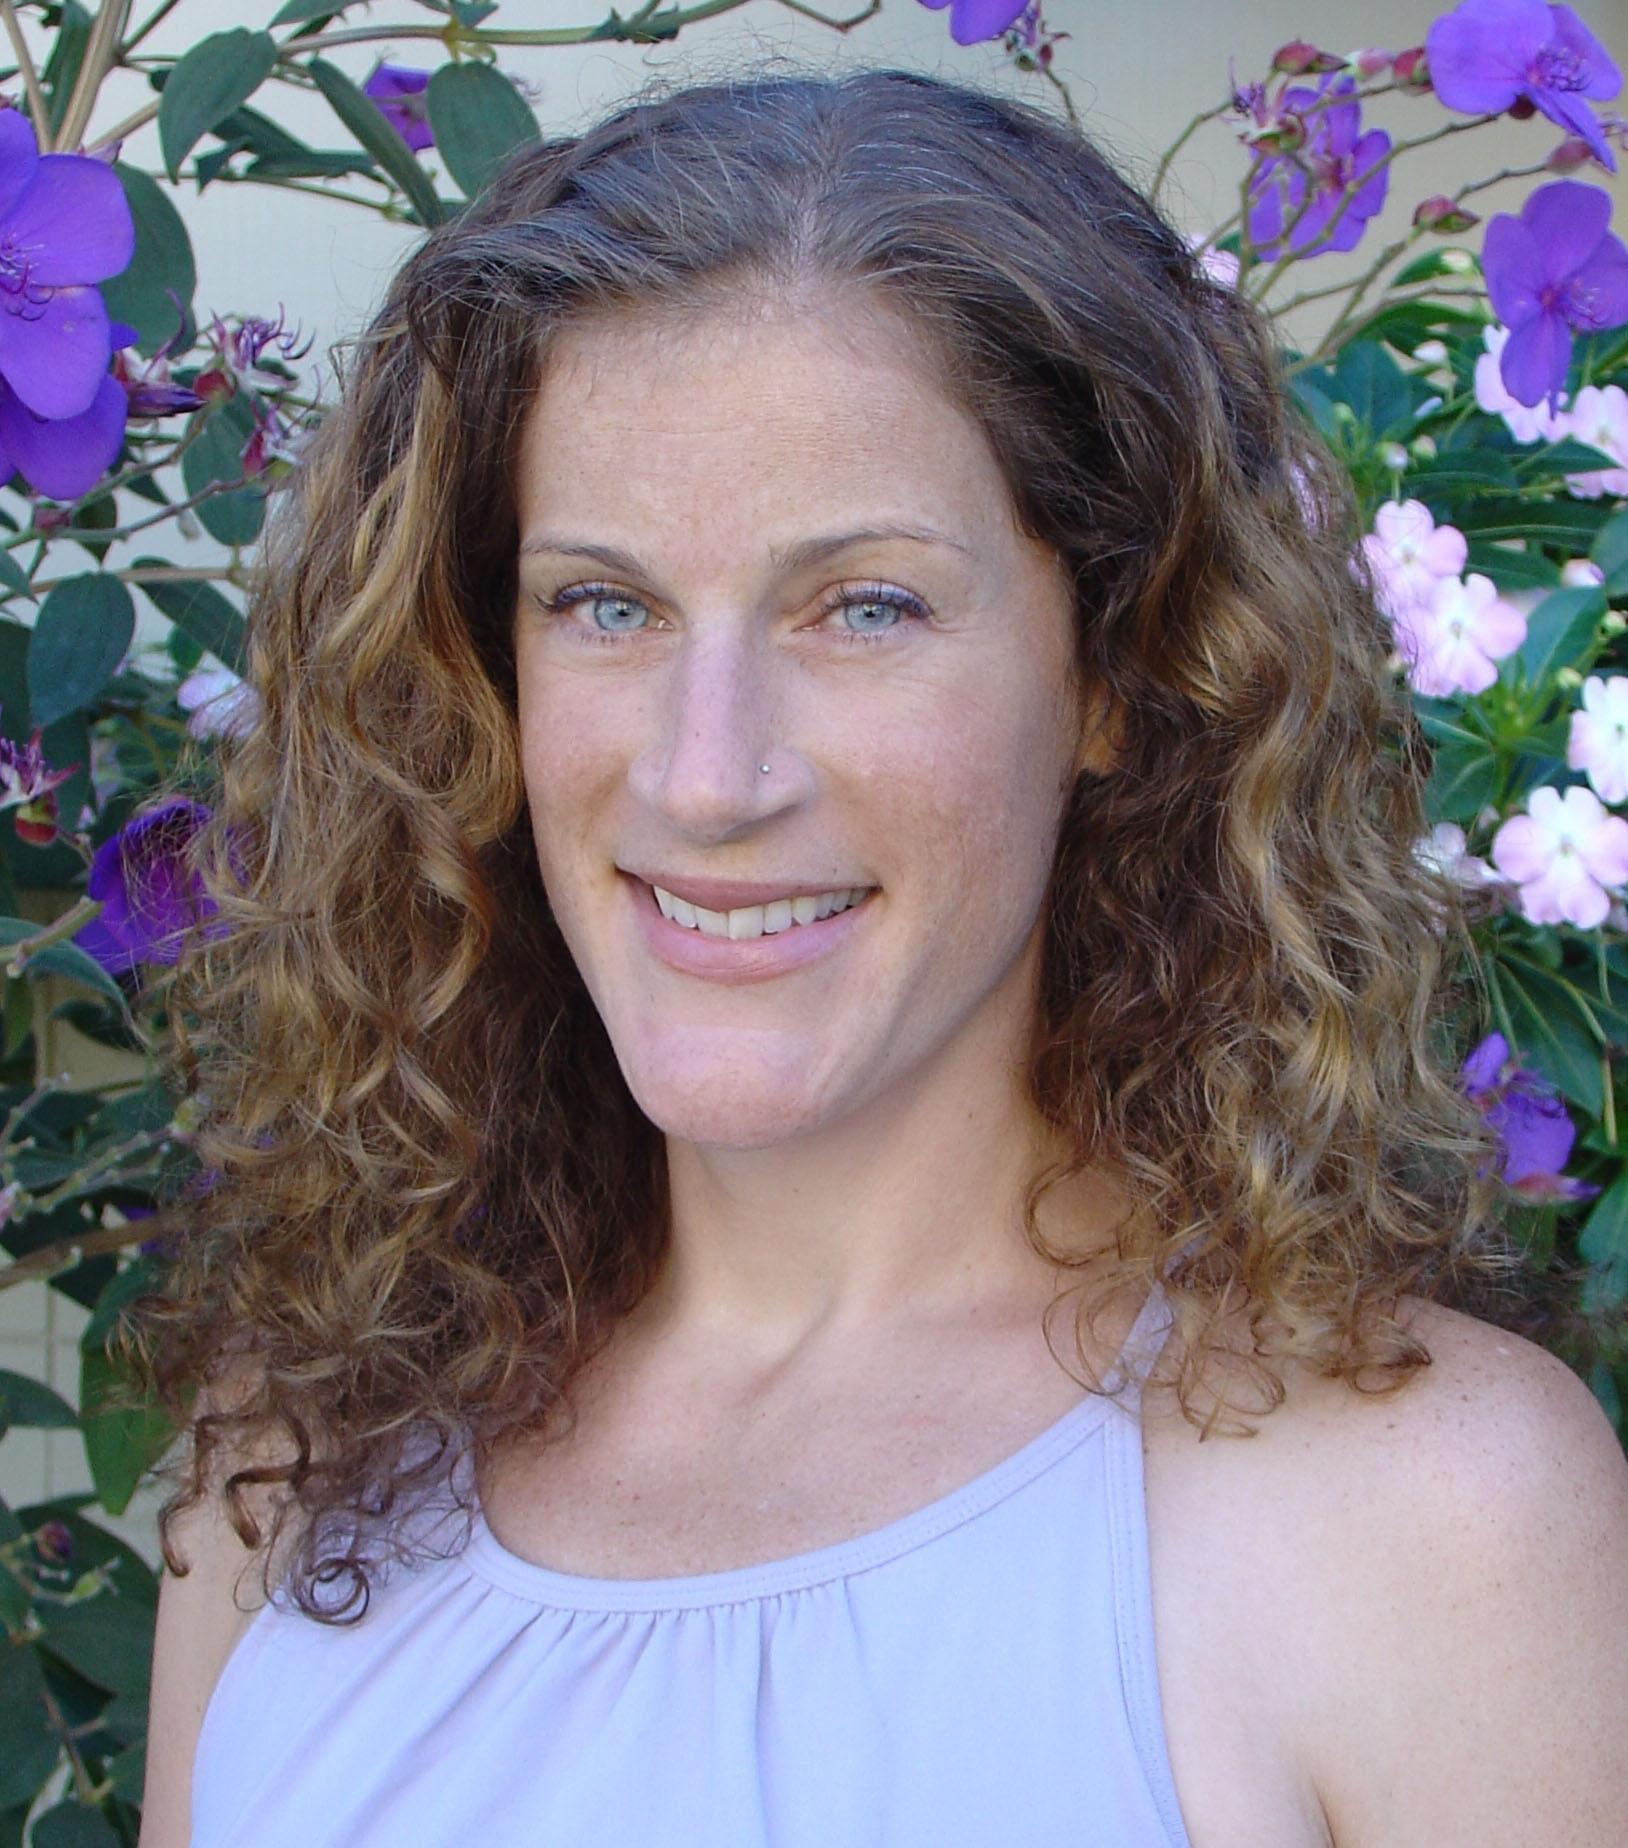 Antonia Fokken